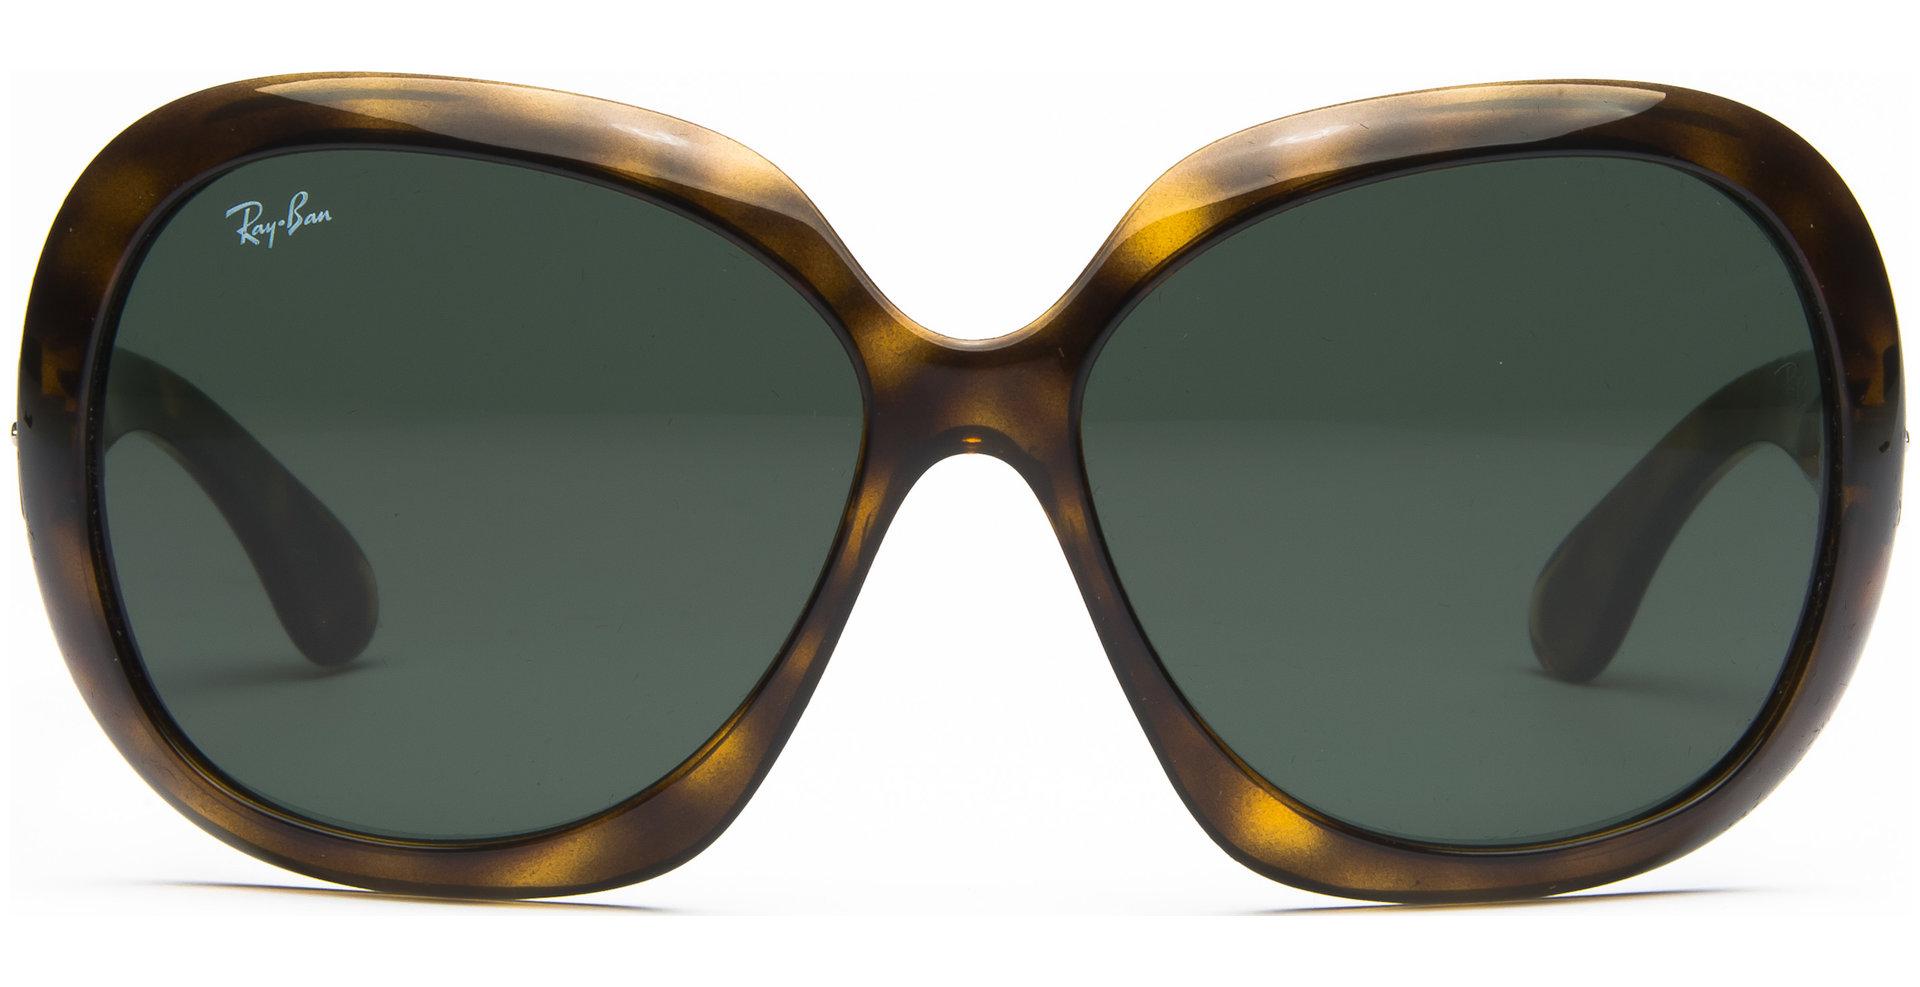 Sonnenbrille Ray Ban Jackie Ohh « Heritage Malta e47f9e37f79c6